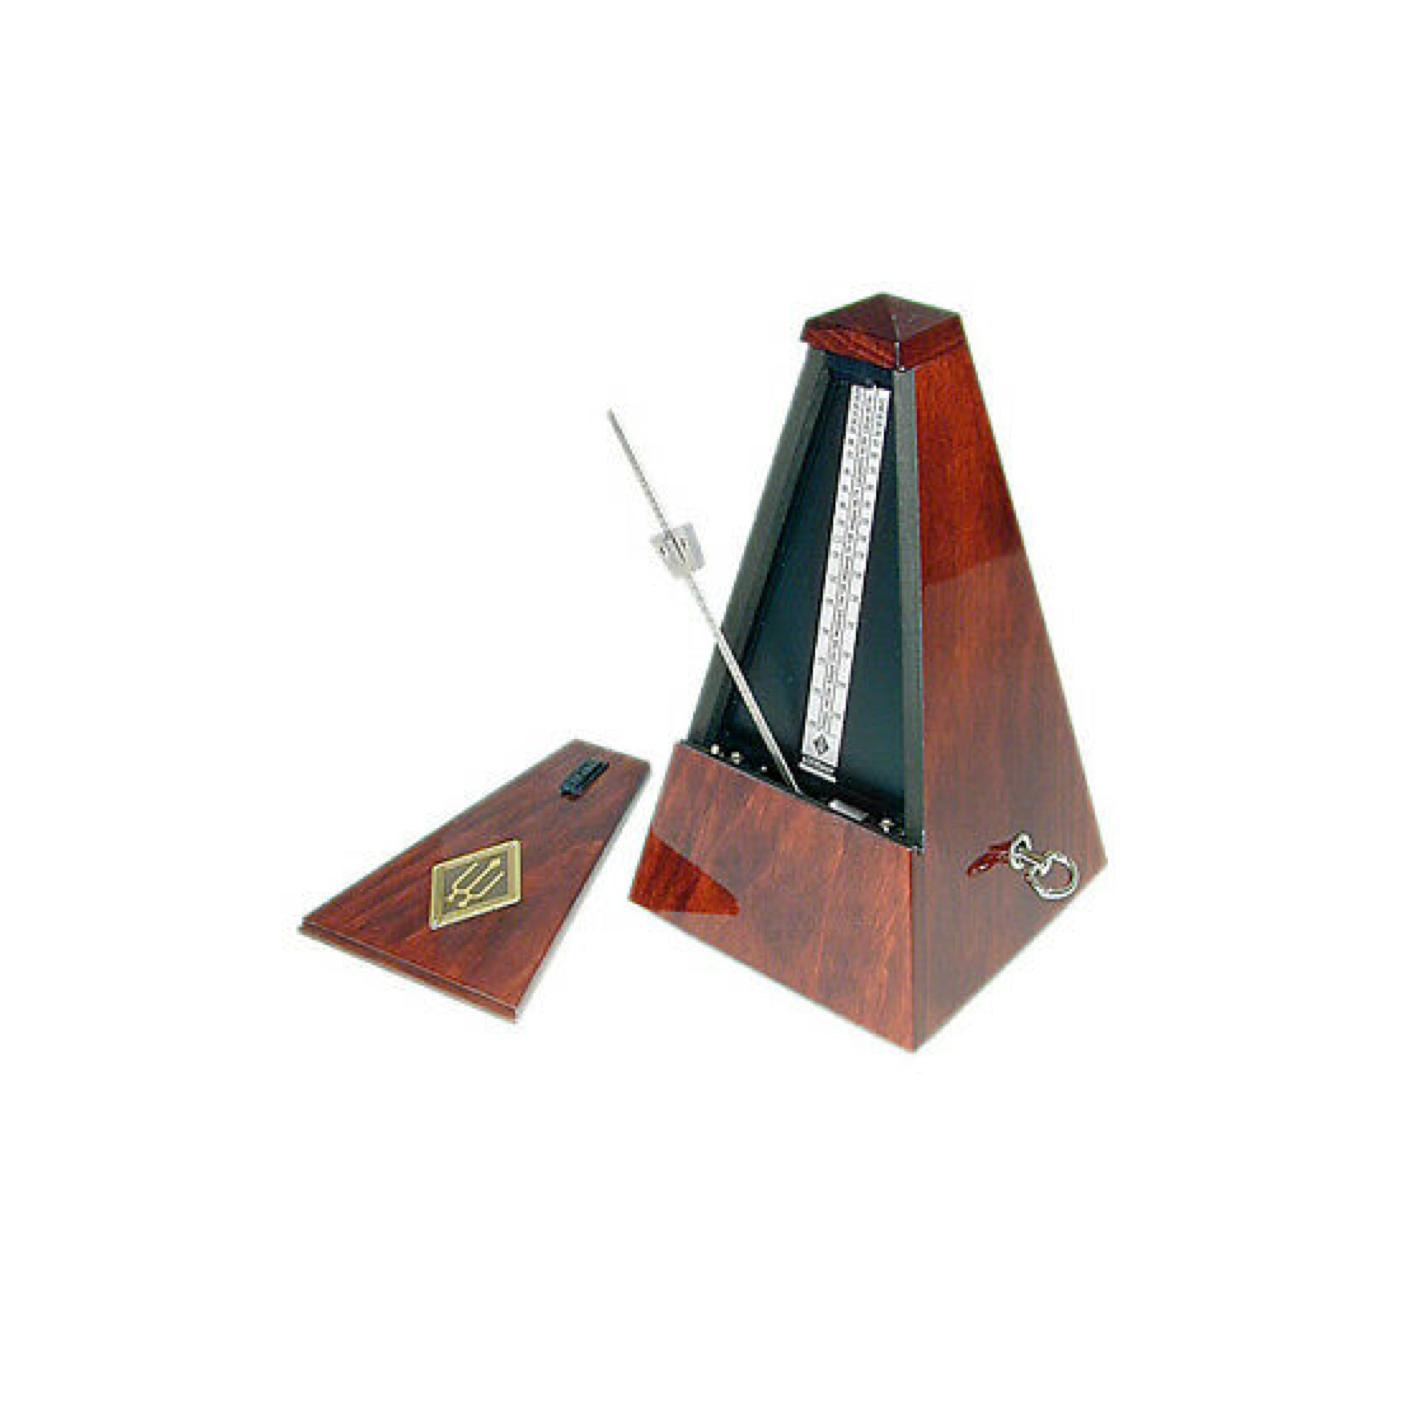 Wittner Mahaogany High Gloss No Bell Metronome 801